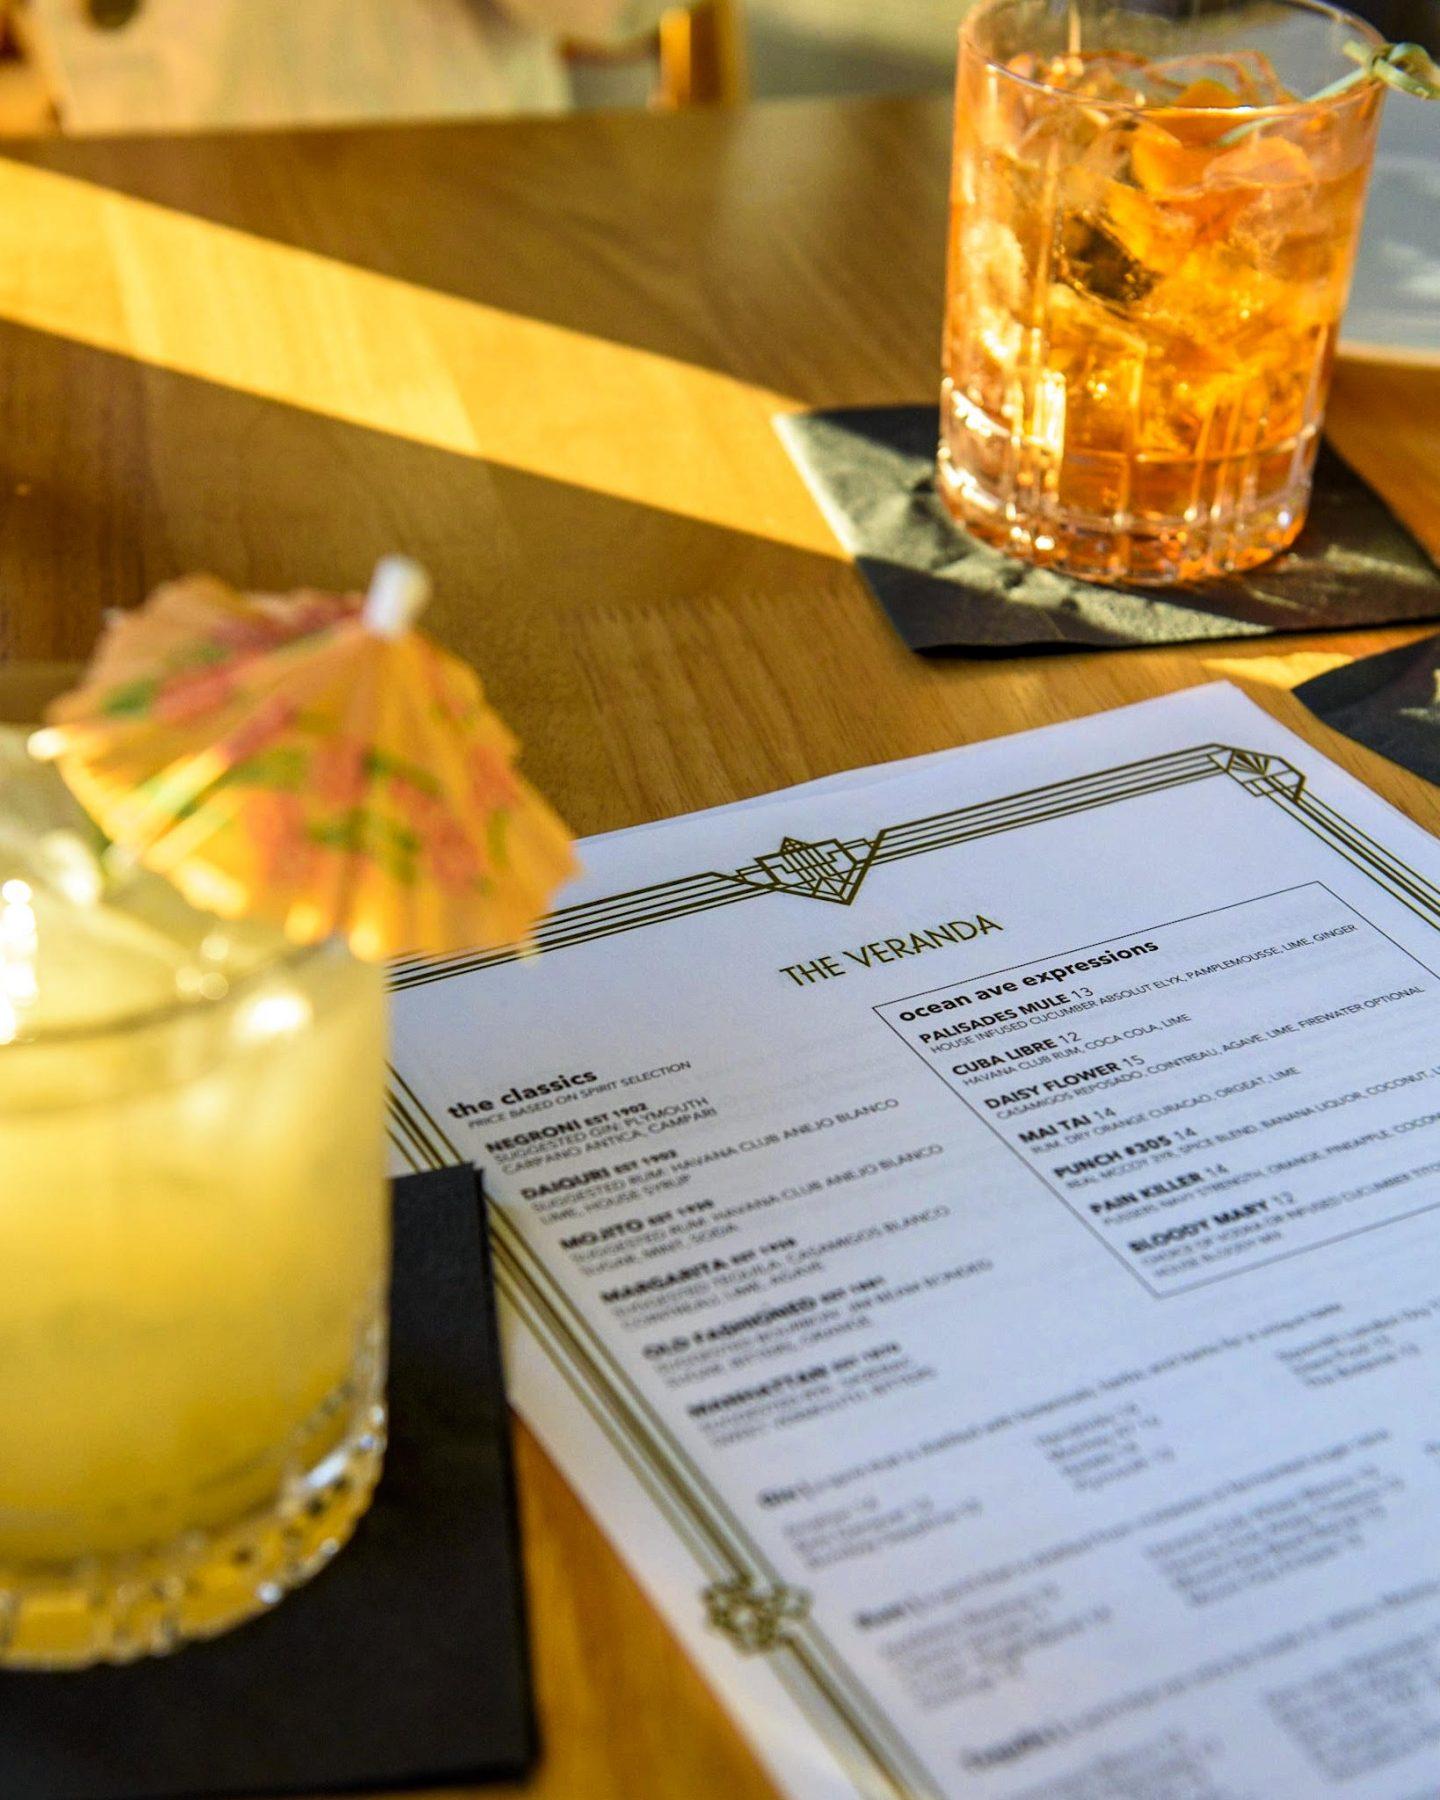 Cocktails at the Veranda Santa Monica